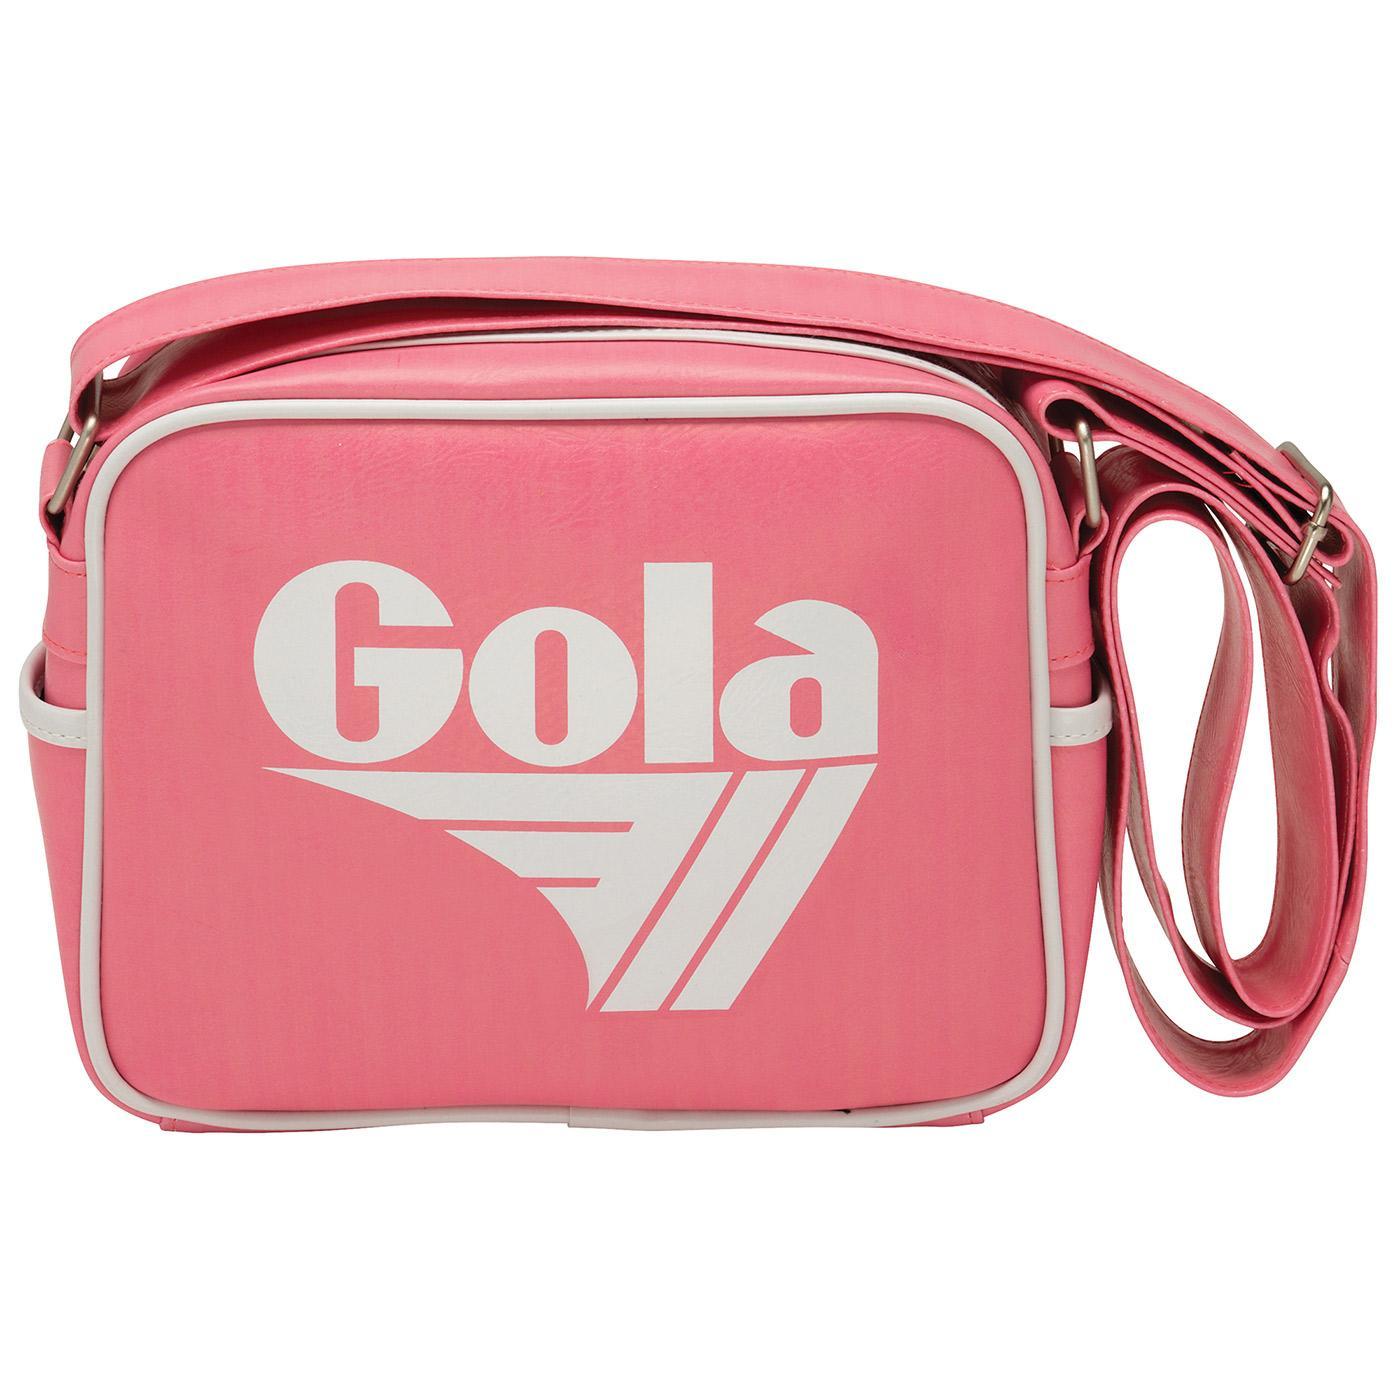 GOLA Micro Redford Retro Shoulder Bag (Pink/White)